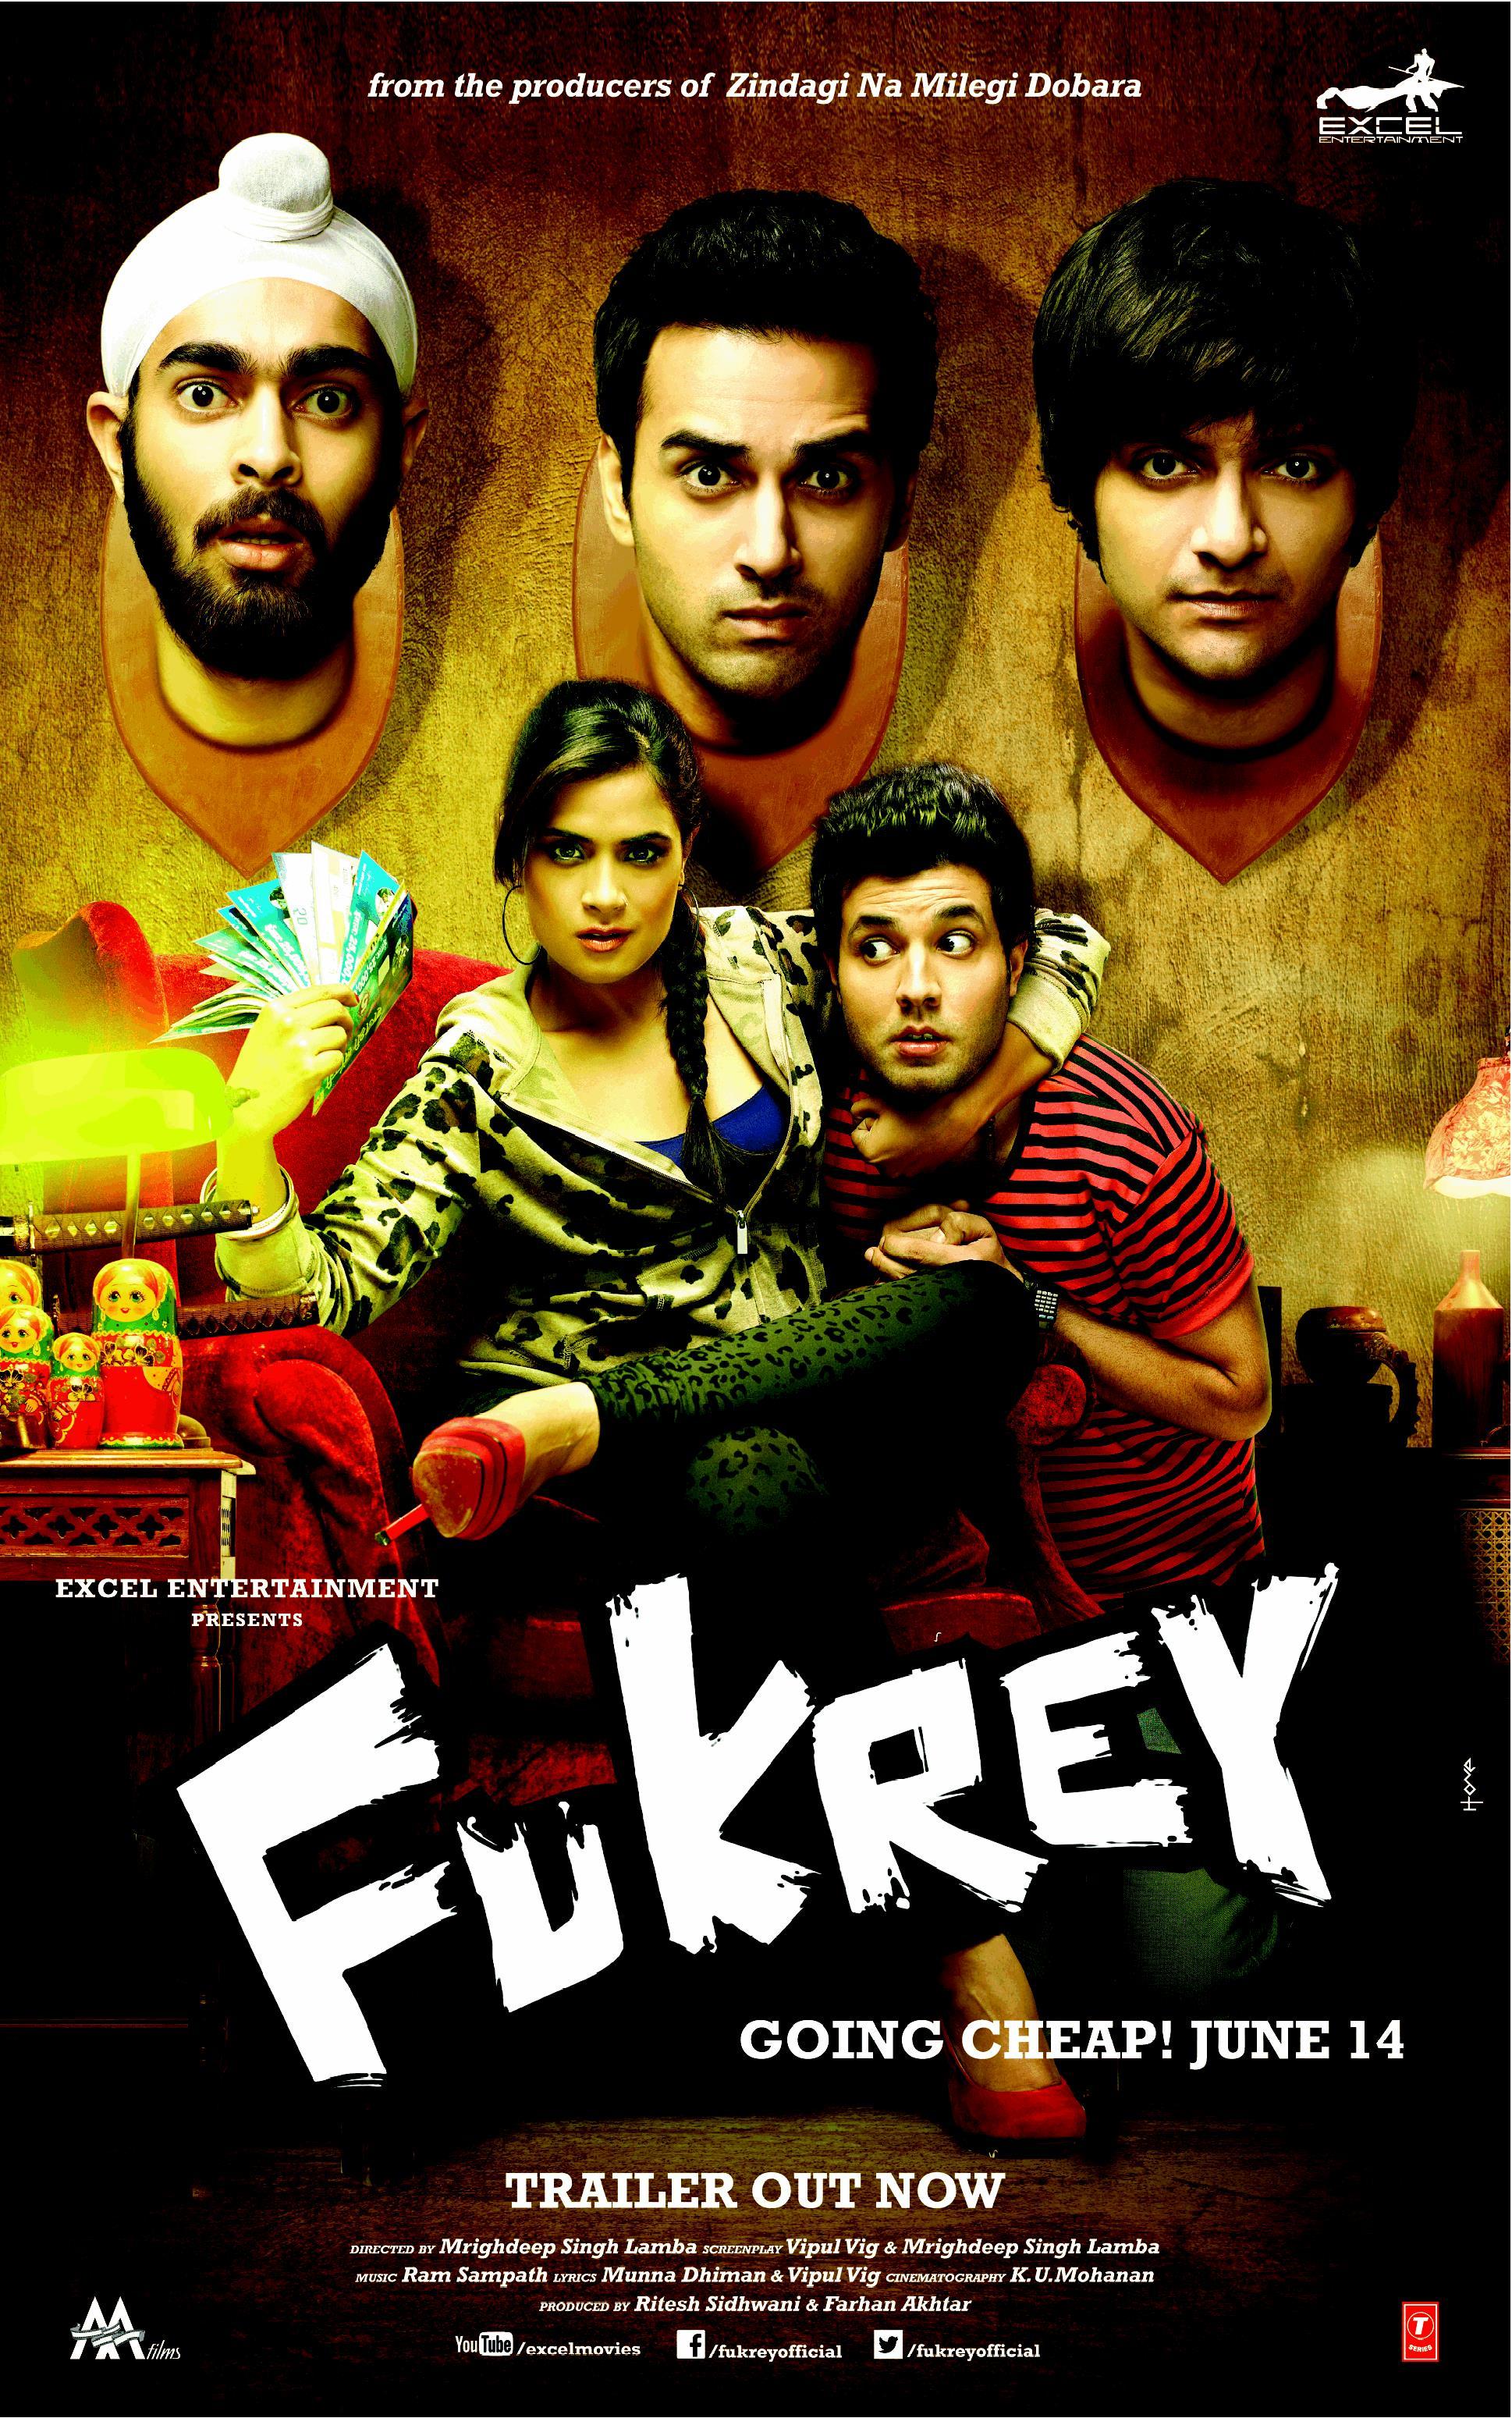 Fukrey (2013) - watch full hd streaming movie online free